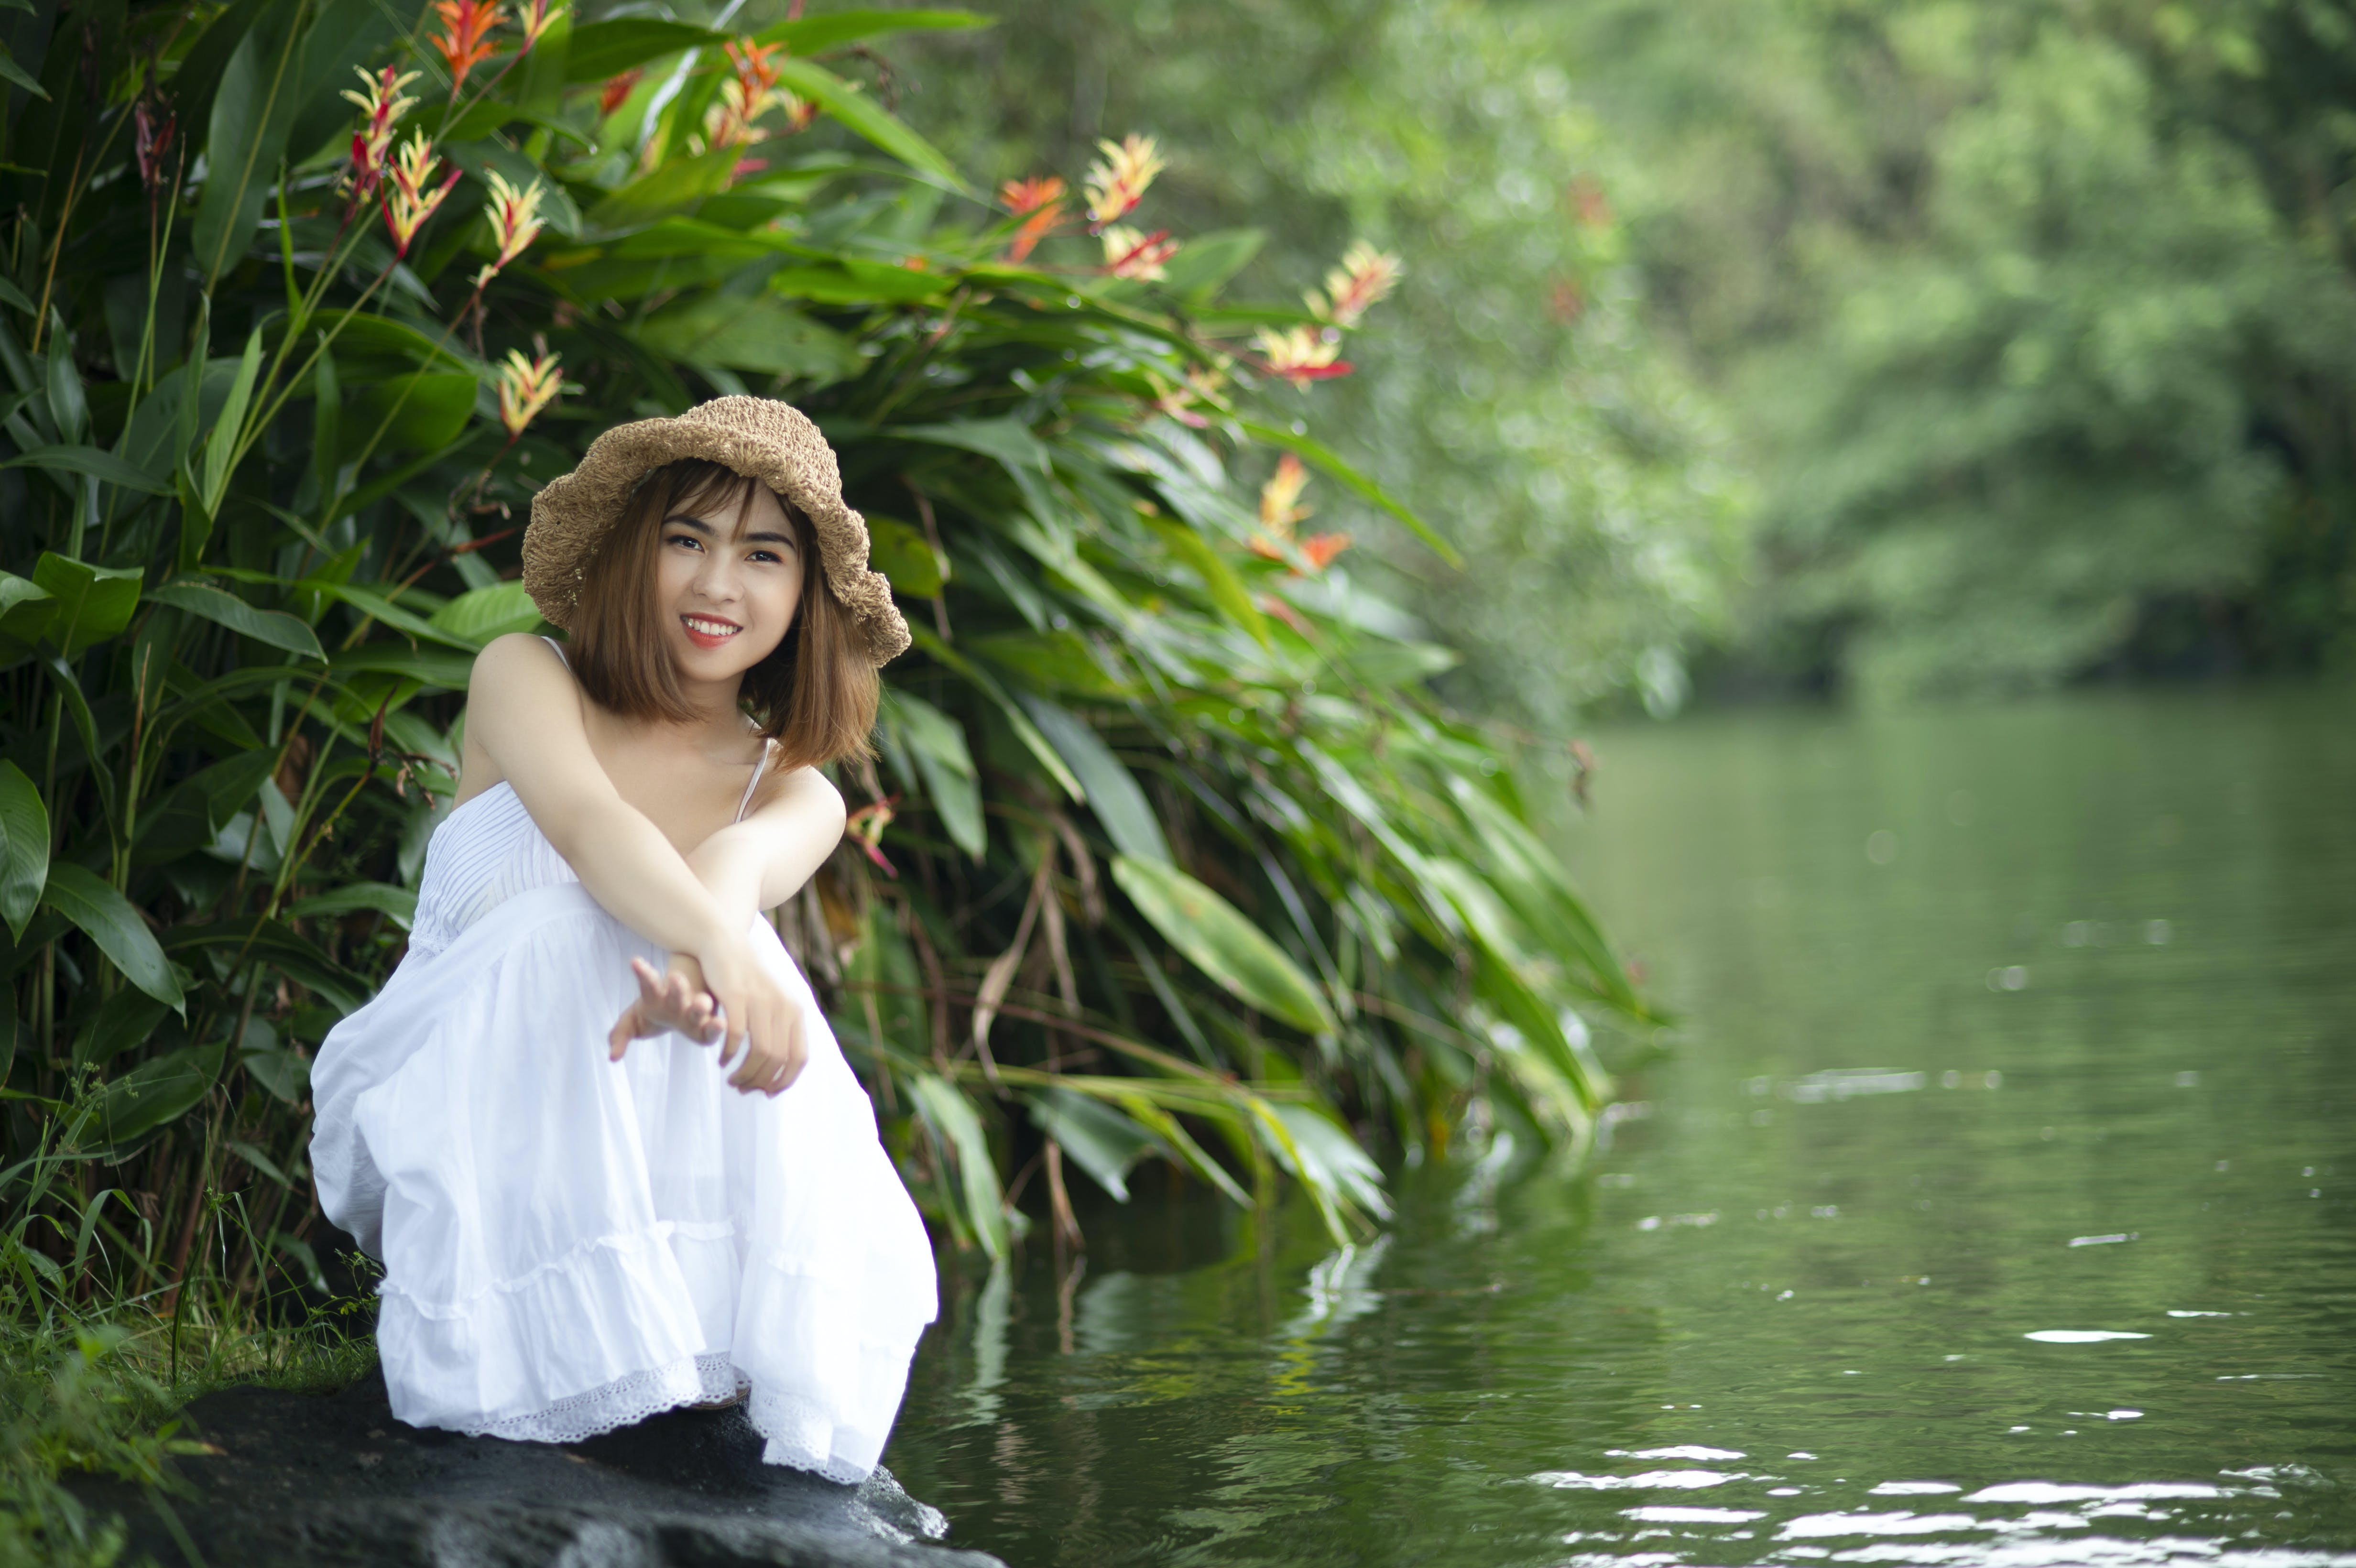 Woman Wearing White Dress Near Body of Water